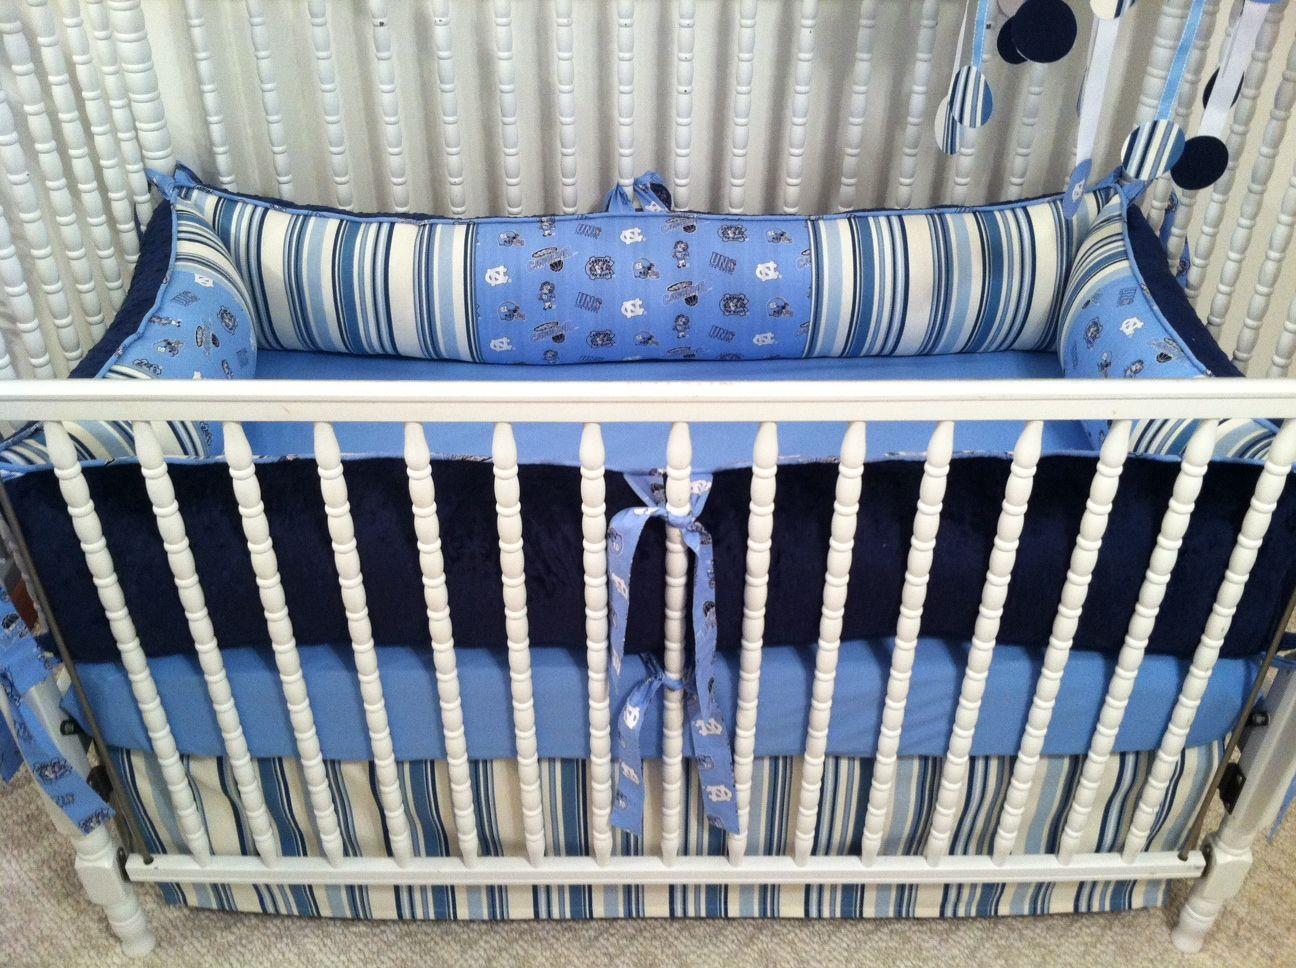 Zellers baby cribs - Unc Tarheels Carolina Baby Nursery Crib Bedding Set Custom Designed By Posh Petites Boutique Navy